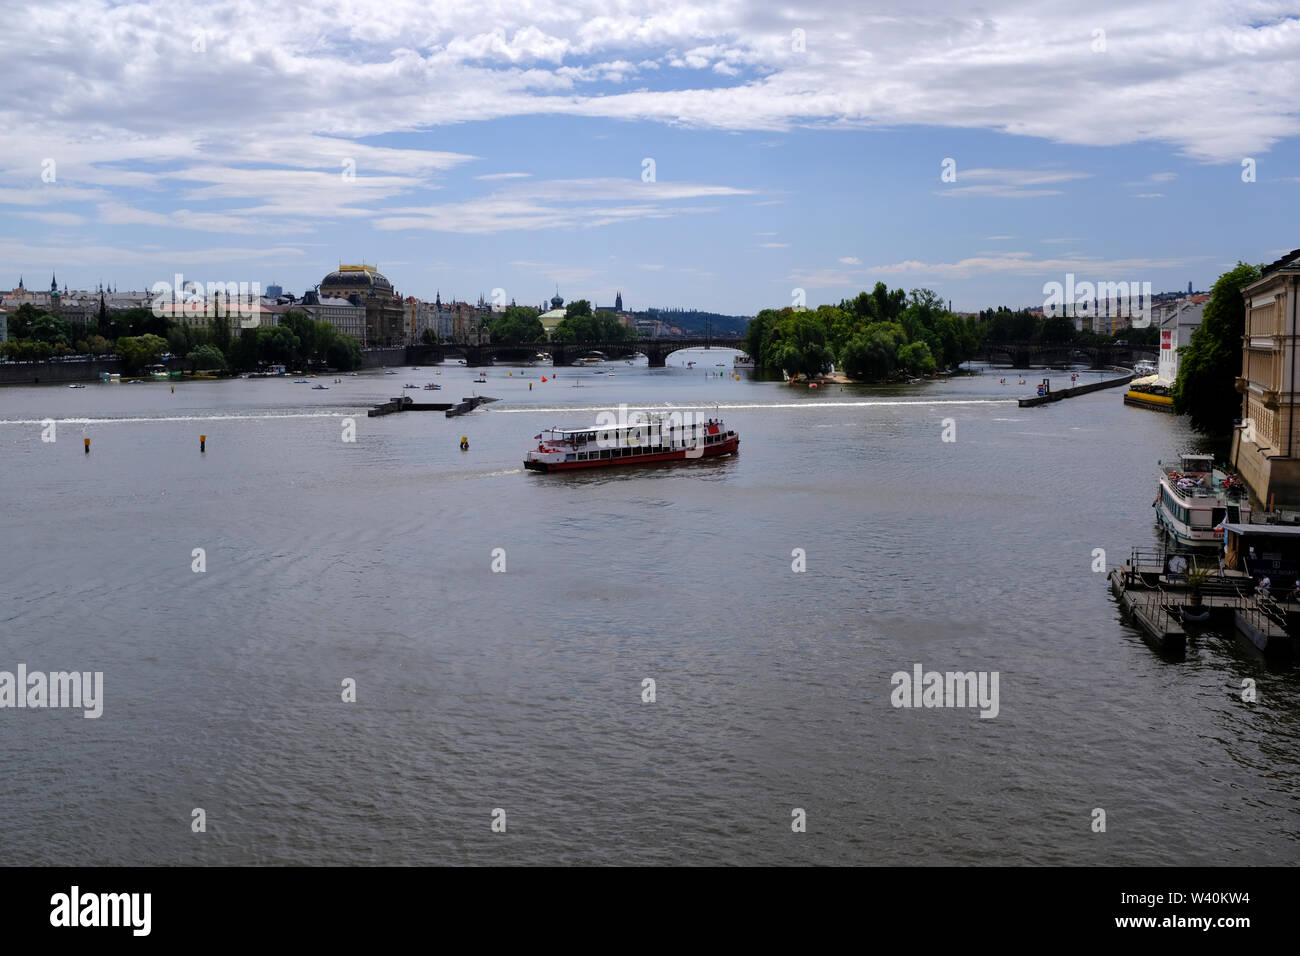 Boat and ship traffic on Vltava River in Prague, Czech Republic - Stock Image